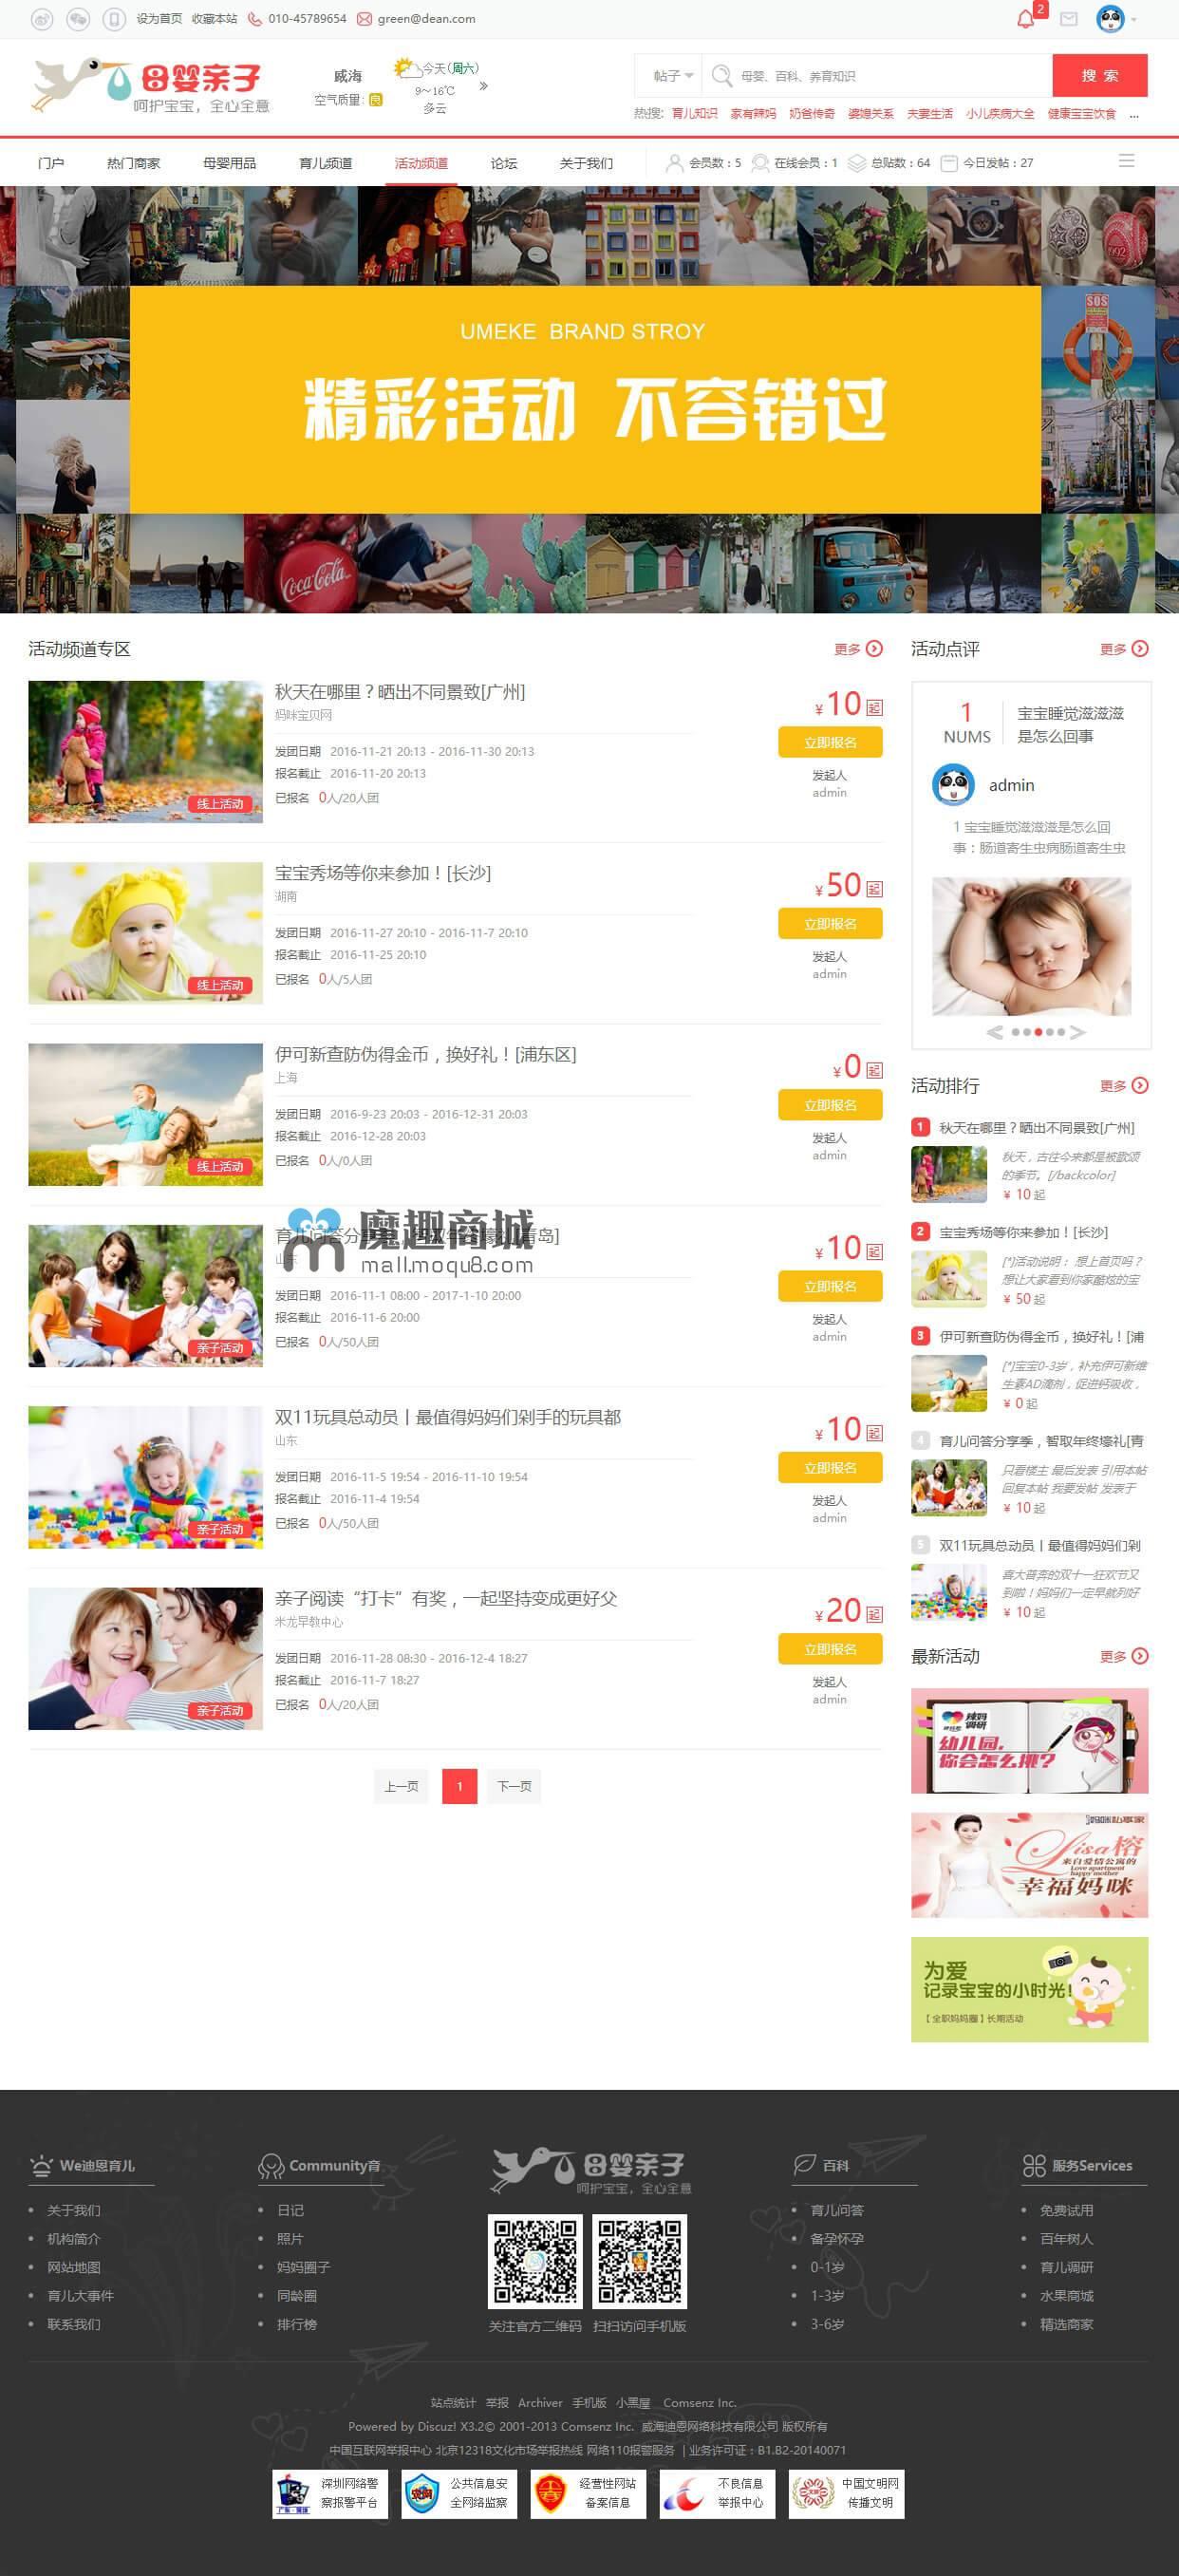 <font color='#ff0000'>魔趣母婴交流奶粉品牌销售模板</font>